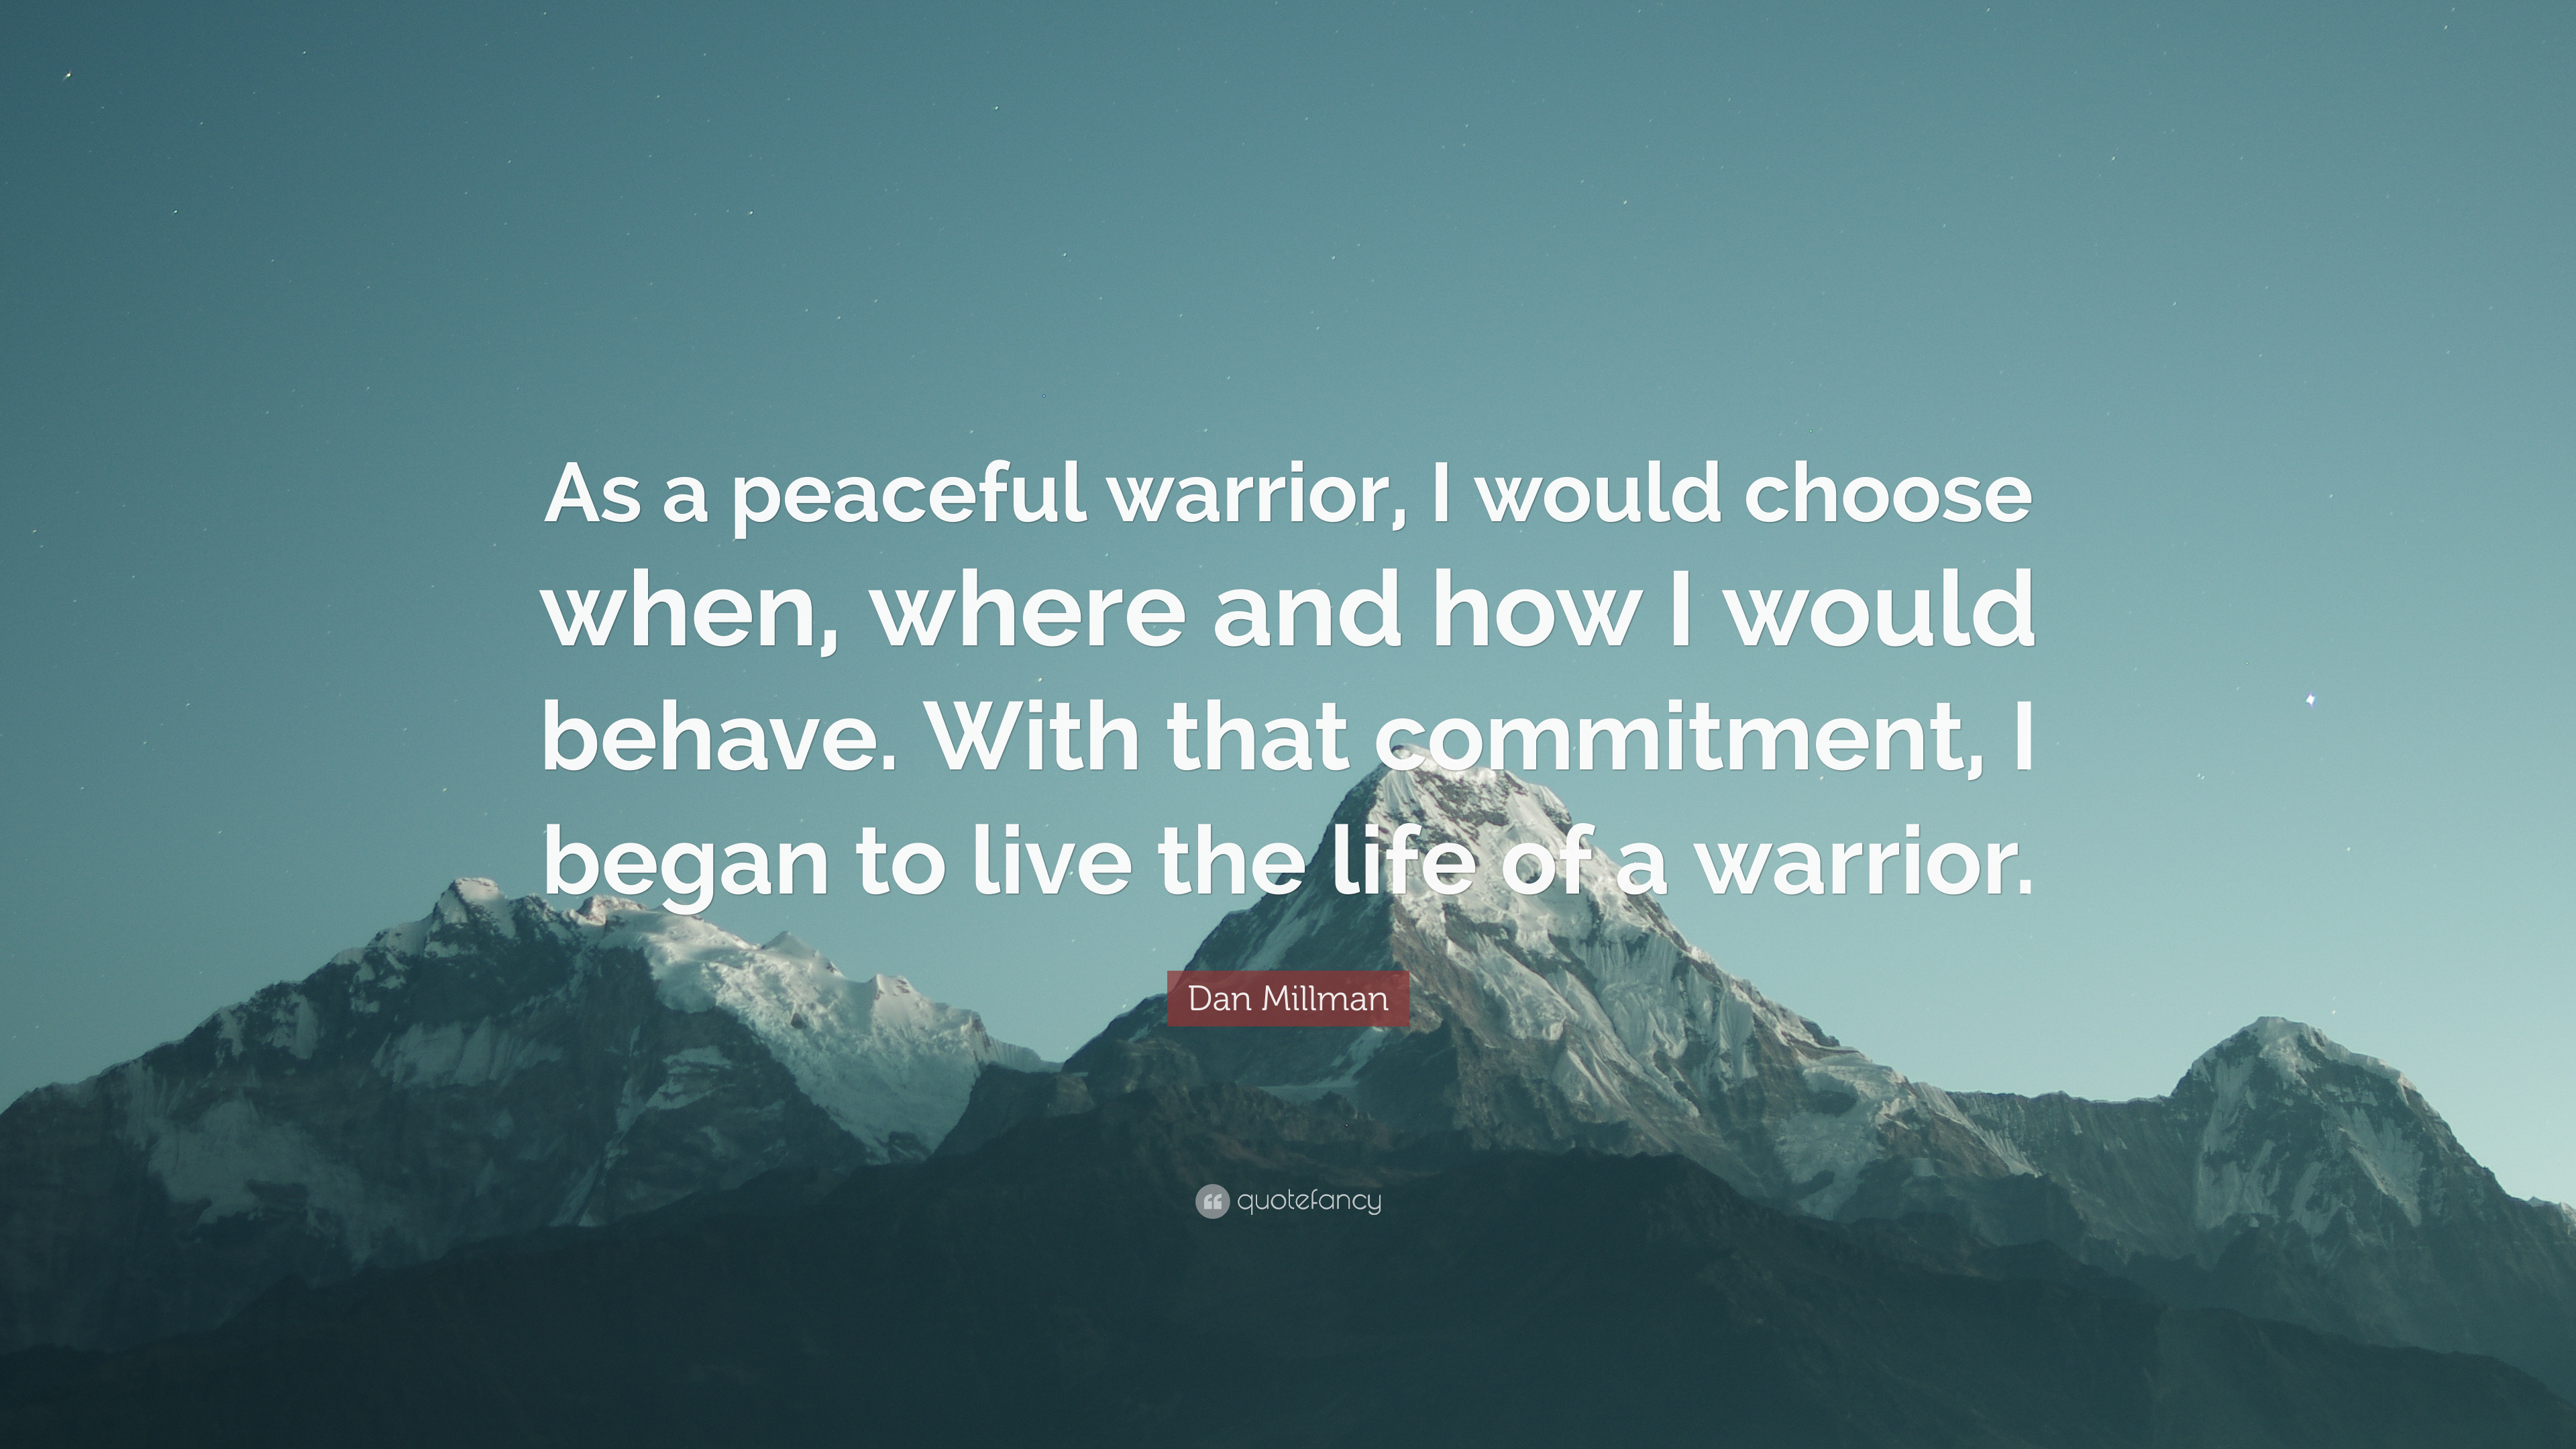 Peaceful pdf the warrior